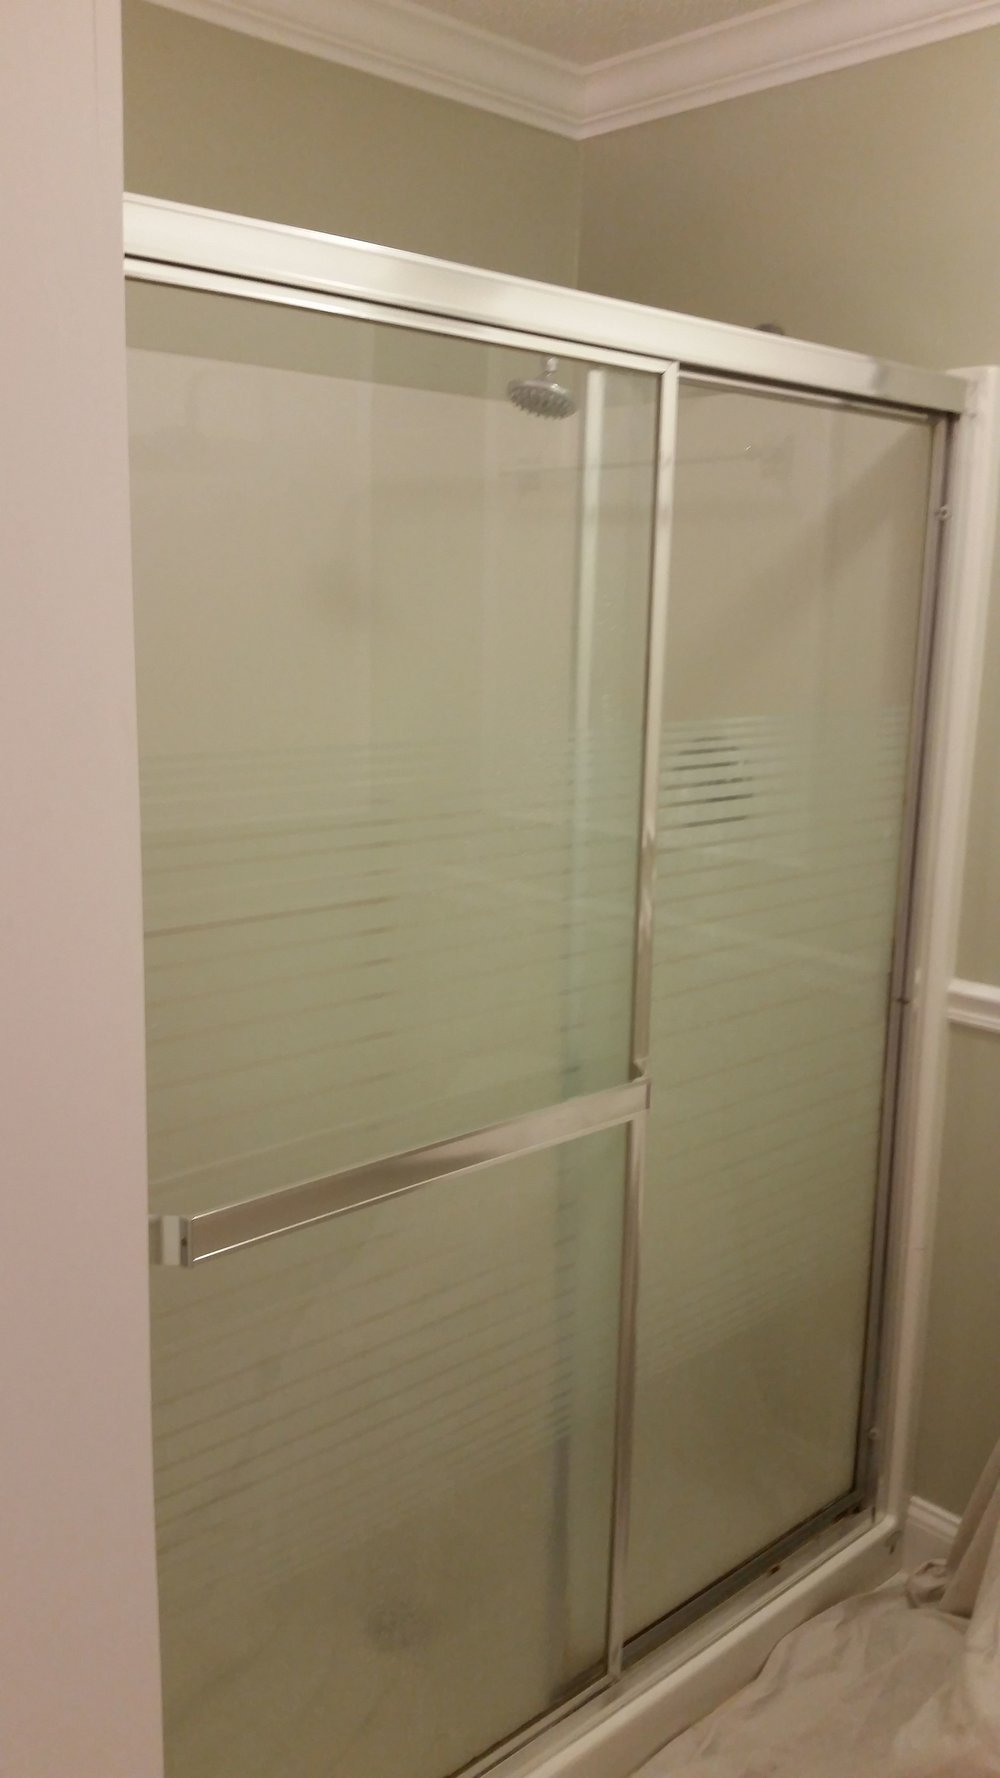 BEFORE - Dated Sliding Doors